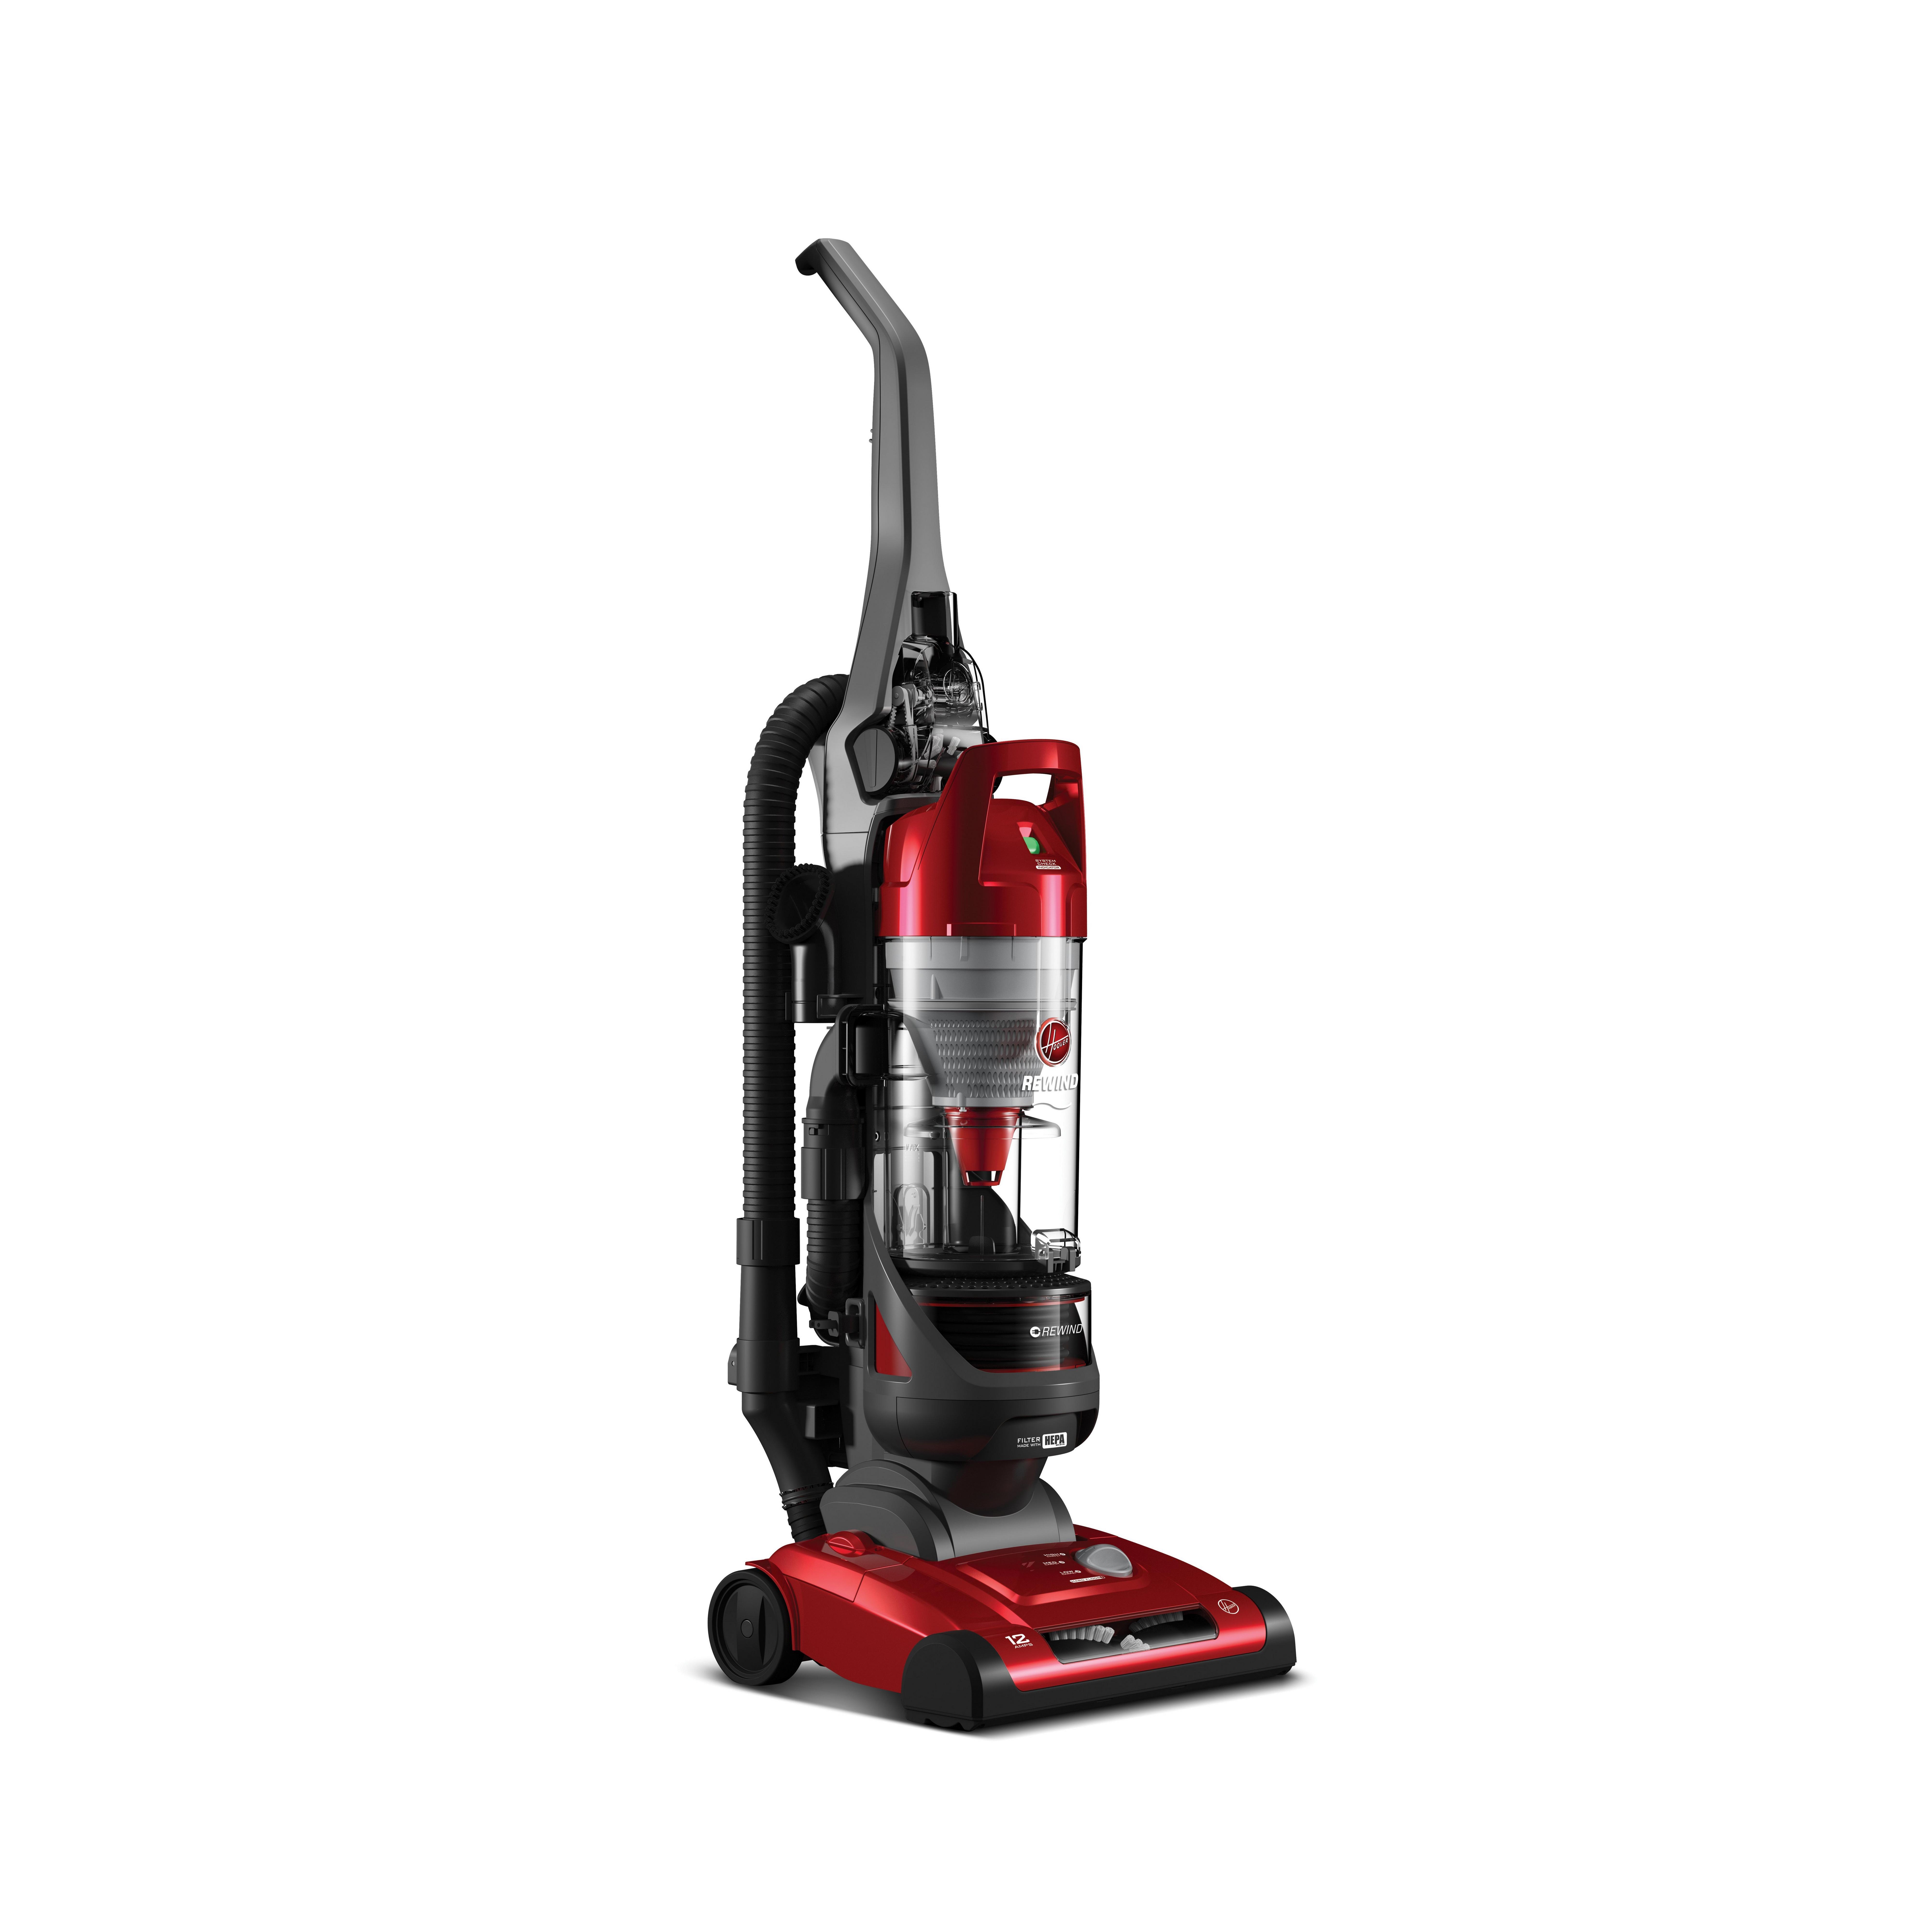 Hoover-Elite-Rewind-Upright-Vacuum-Cleaner-Damaged-Box-UH71012DM thumbnail 2